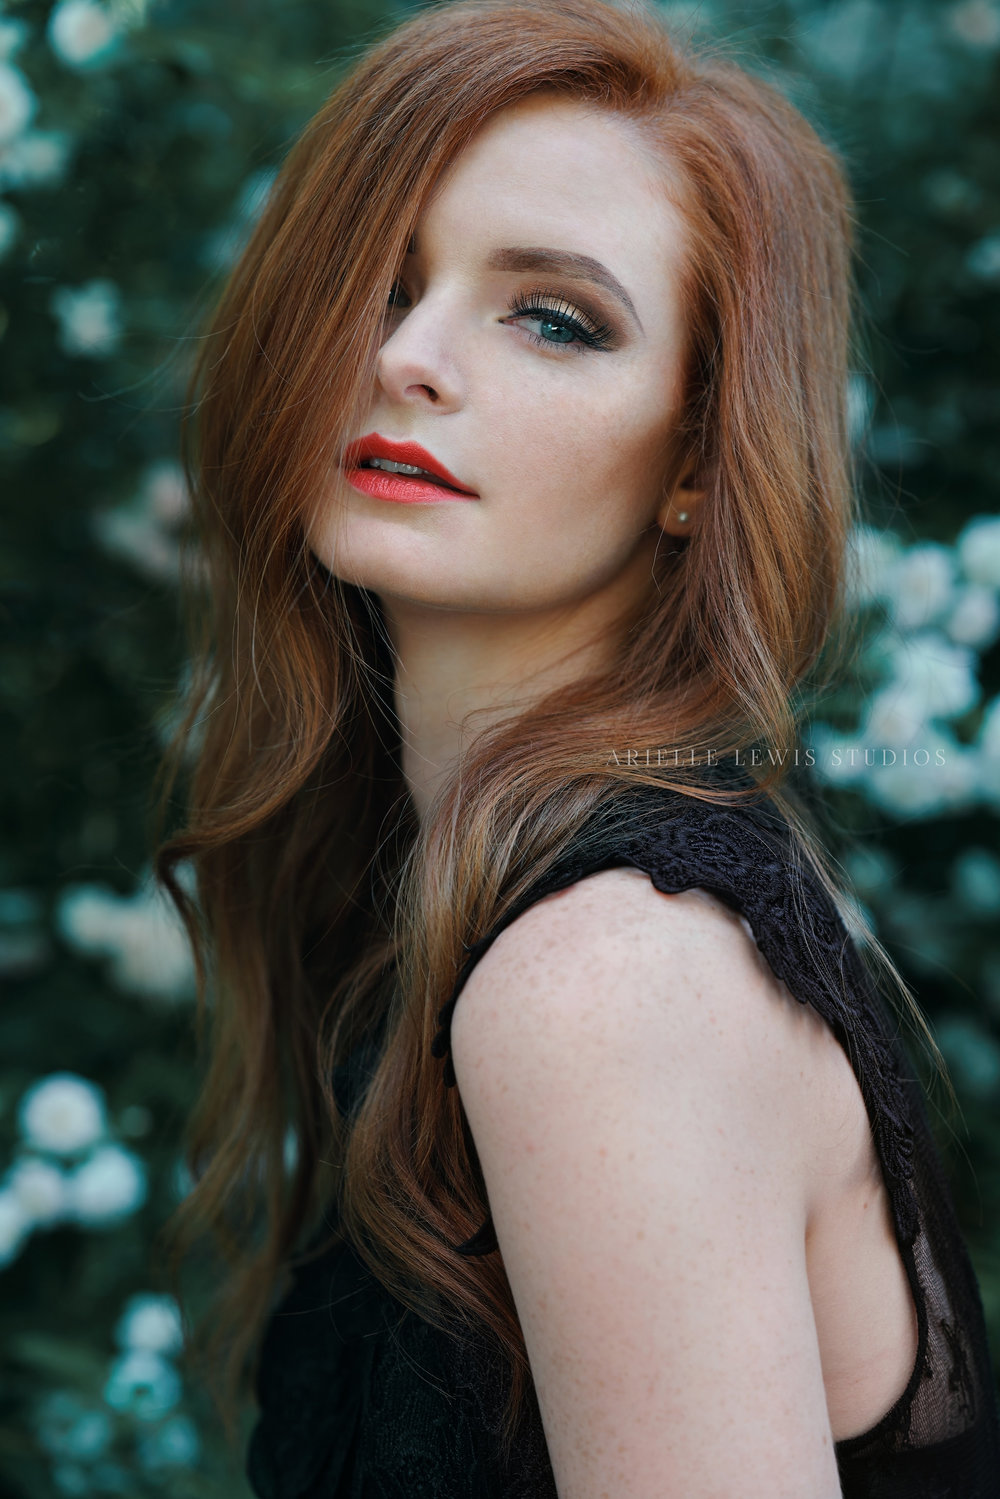 redhead_portrait_dc.jpg